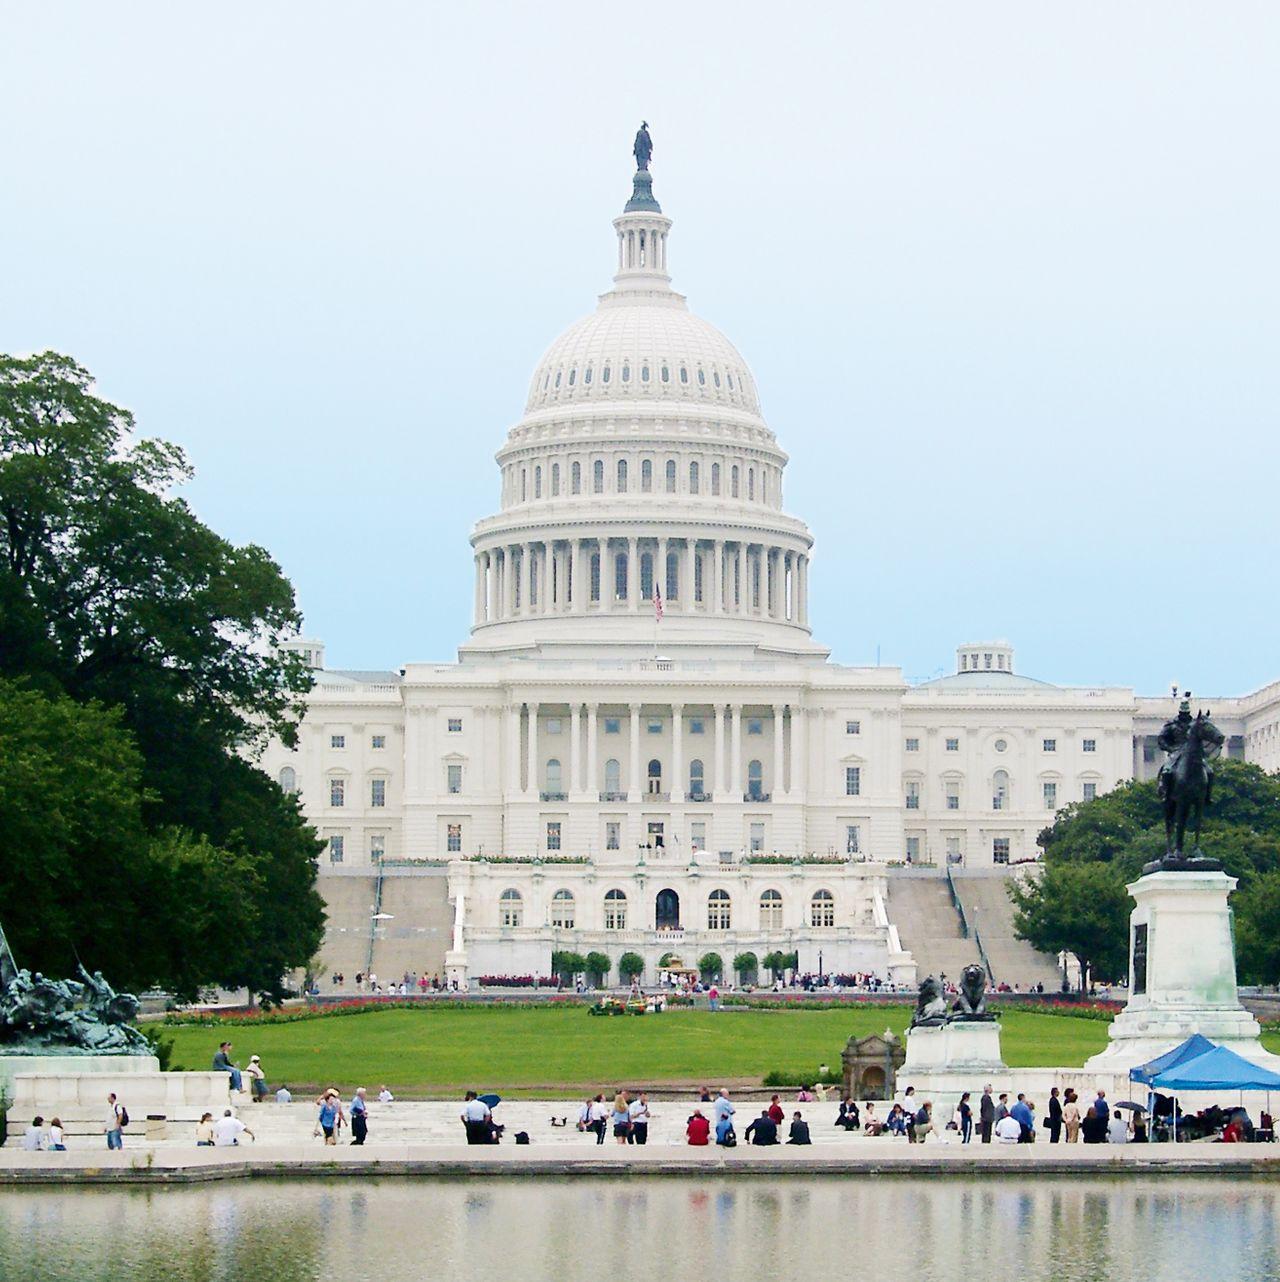 Pauschalreisen Washington DC - Expediade